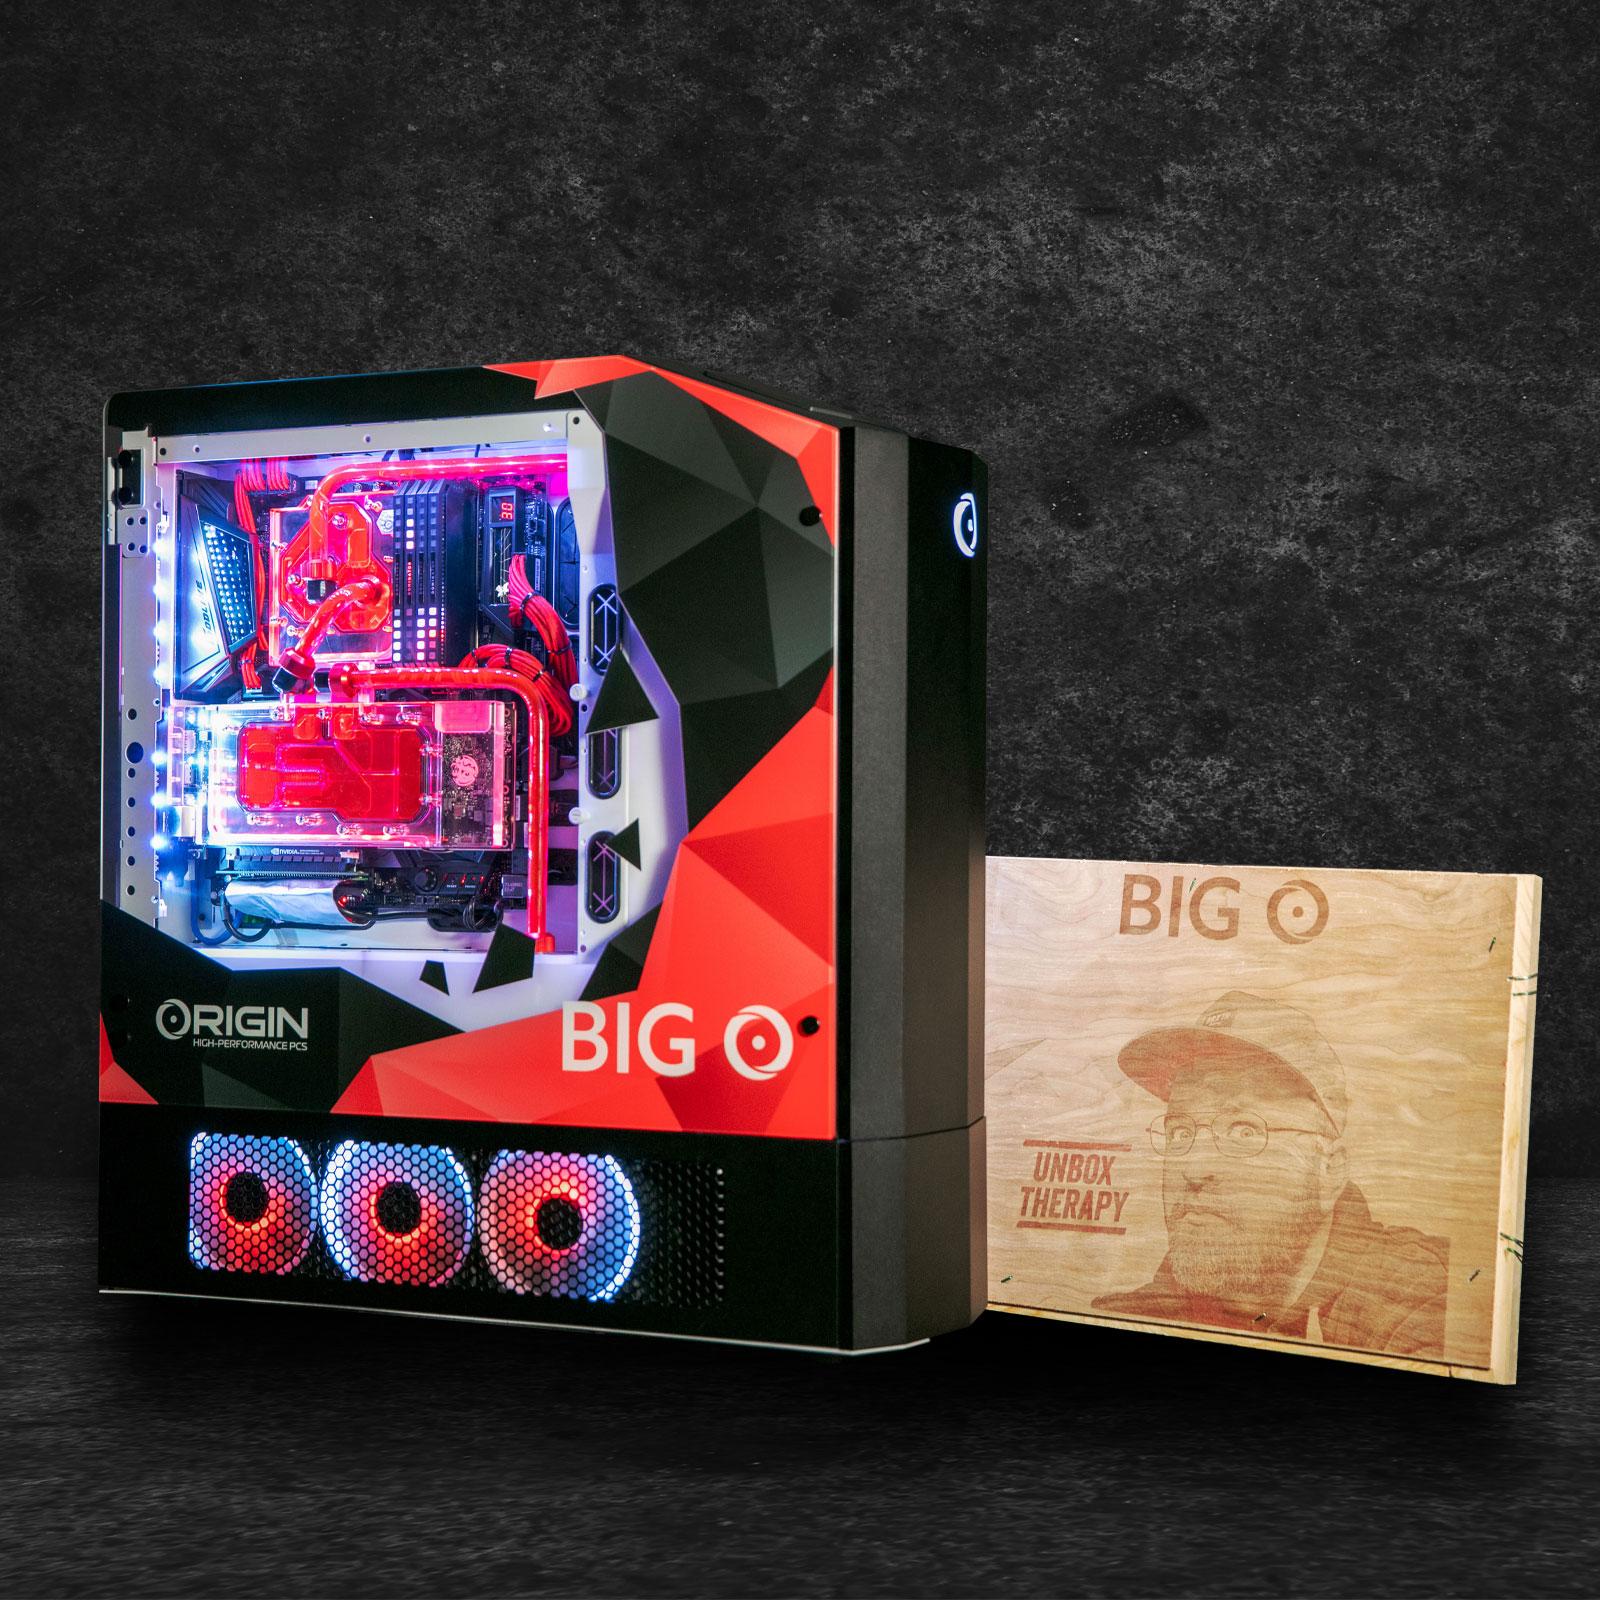 Origin PC debuts Big O PC that incorporates PS4, Xbox, Switch and PC into one machine 1